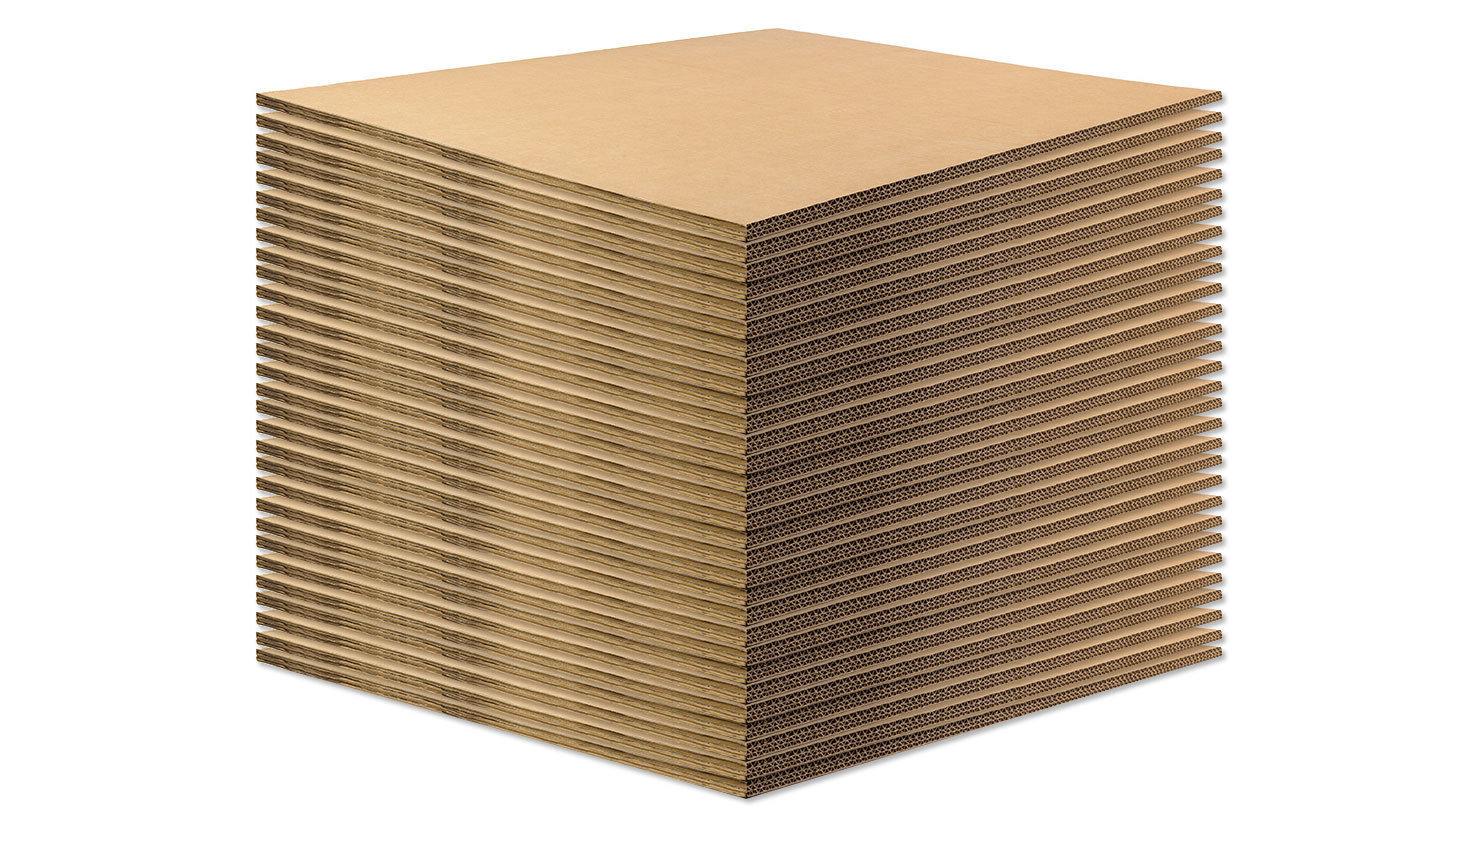 BASE IN CARTONE per ECOPALLET 40x60 cm 14mm • 50 pezzi